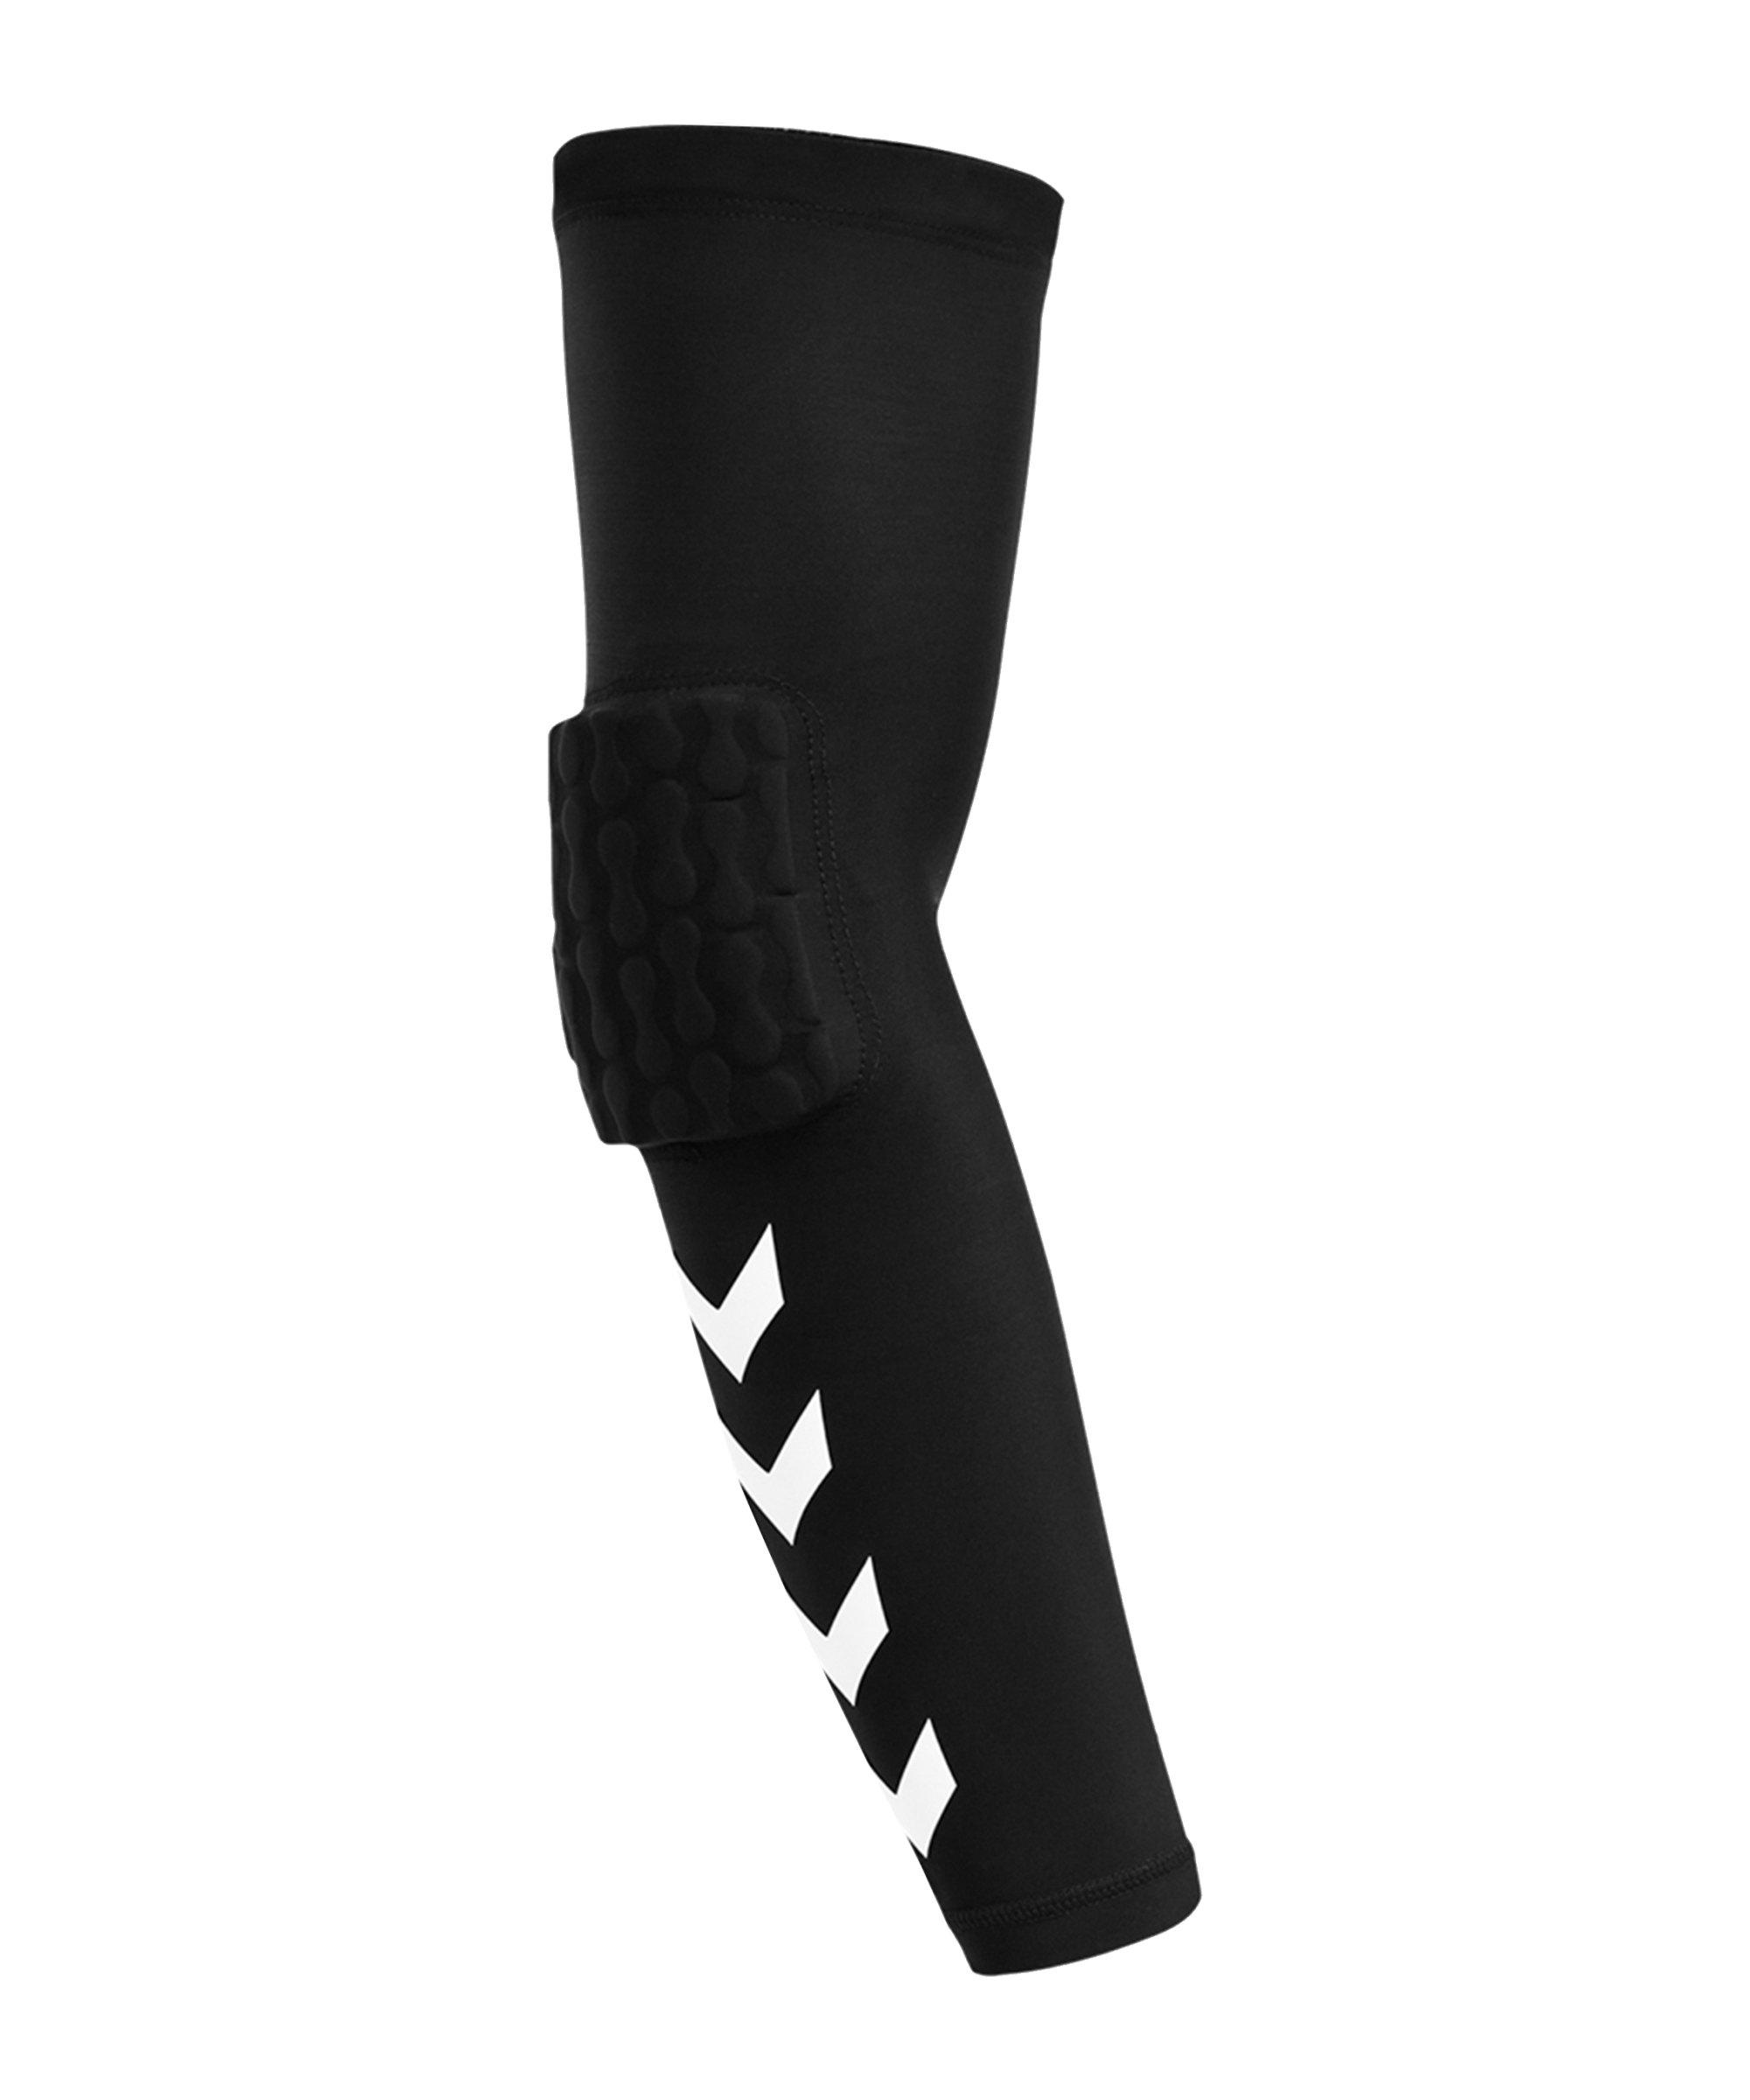 Hummel Protection Elbow Long Sleeve Schwarz F2001 - schwarz